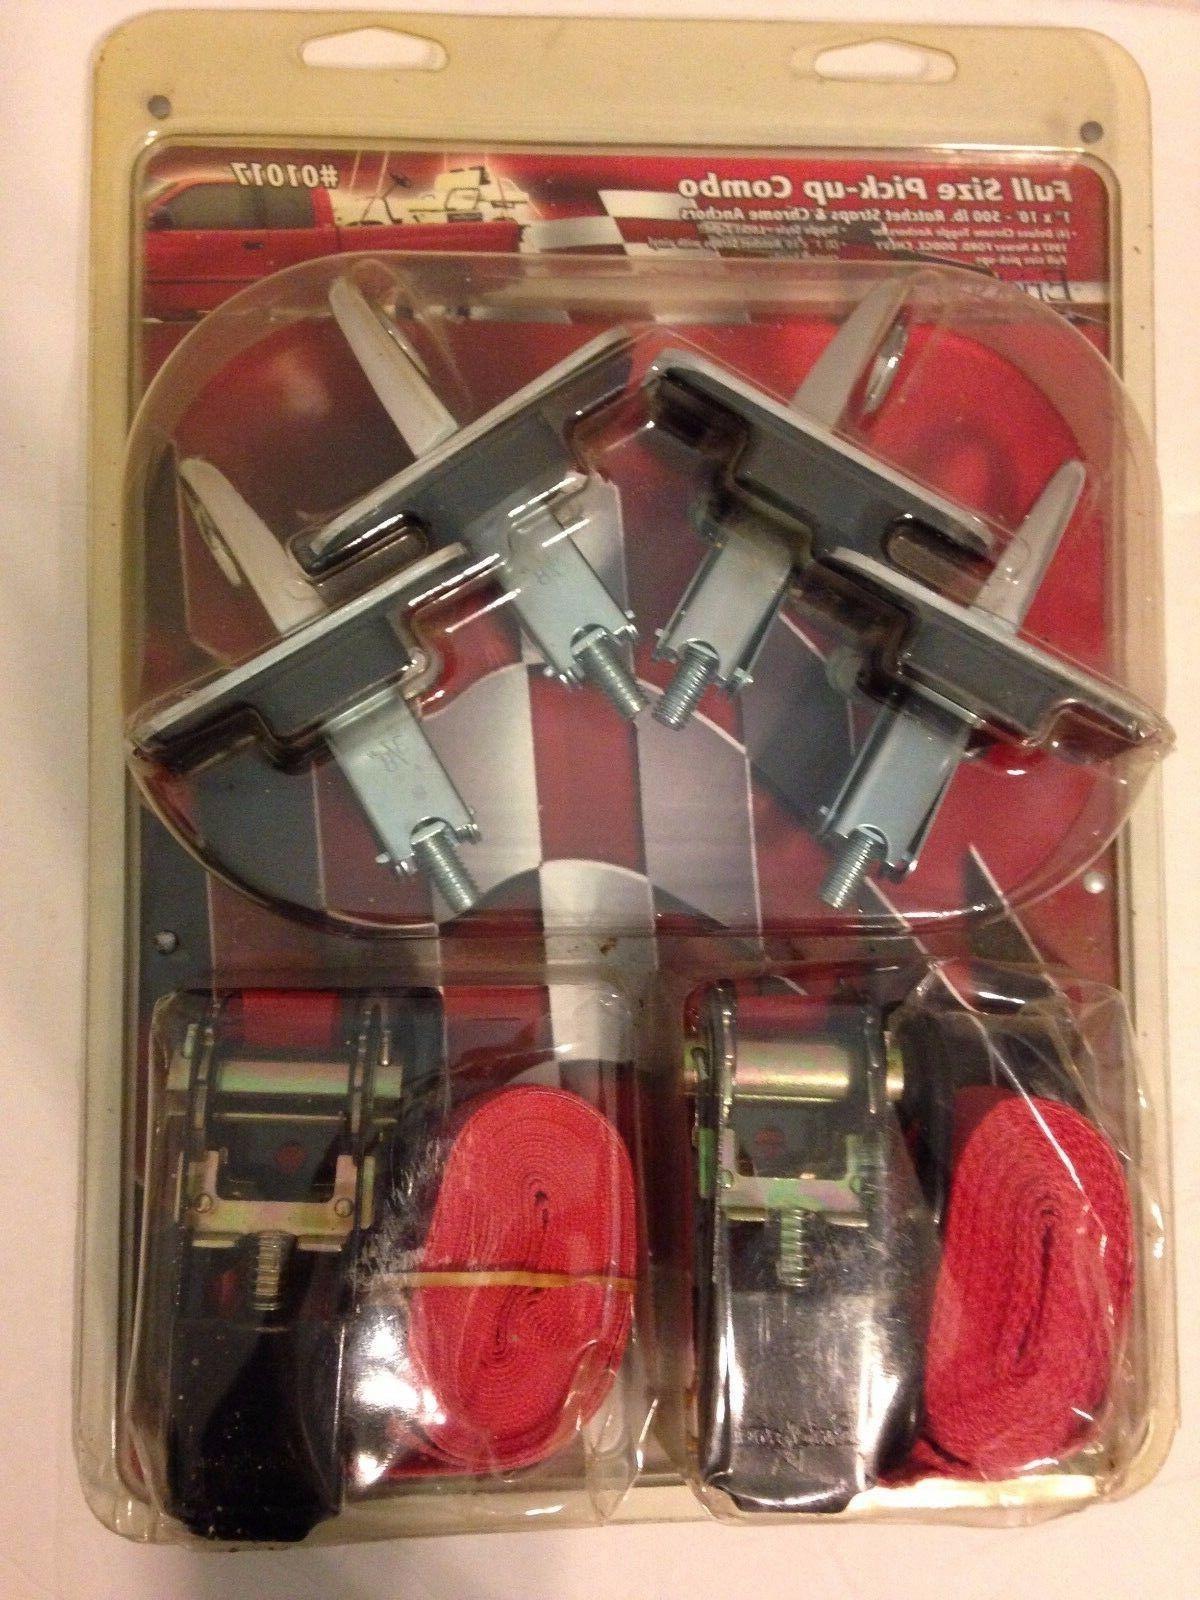 01017 1 x 10 2 ratchet straps